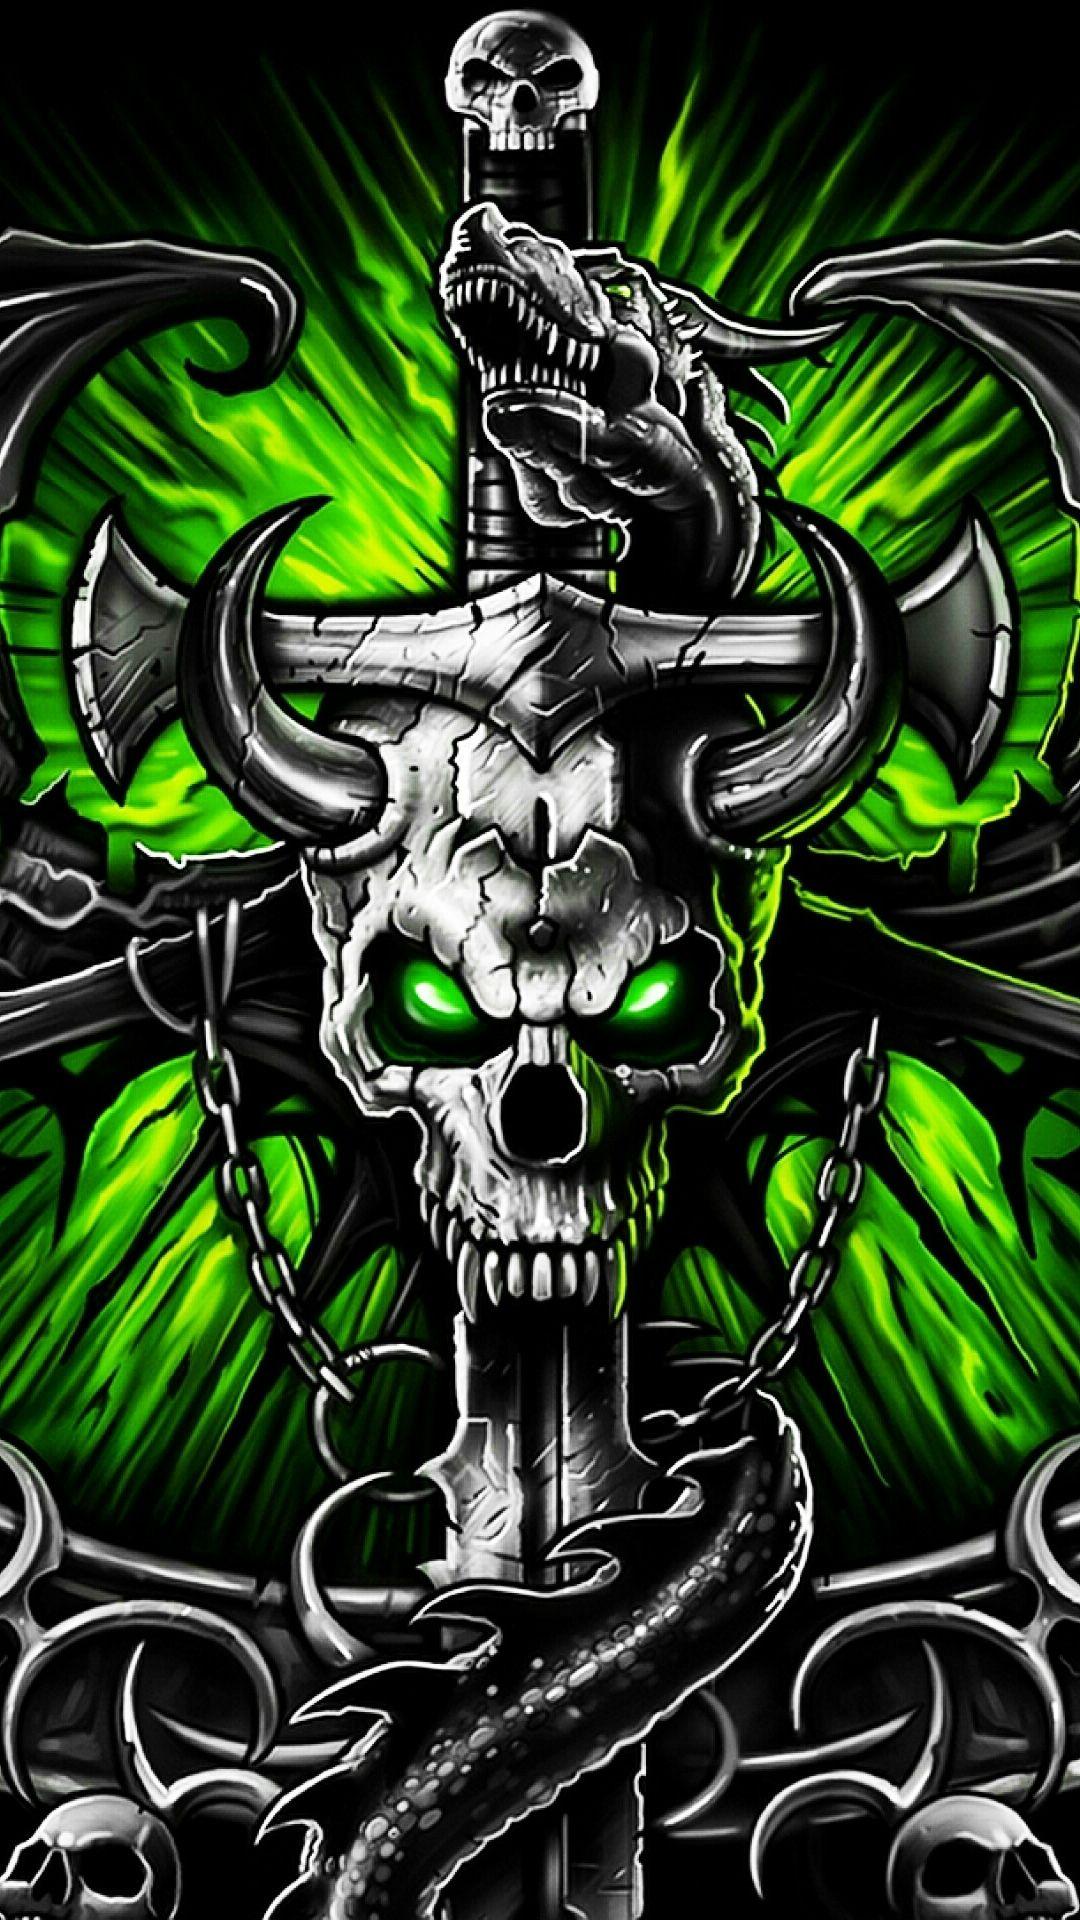 Gothic Metal Graffiti Skull Theme has the green metal